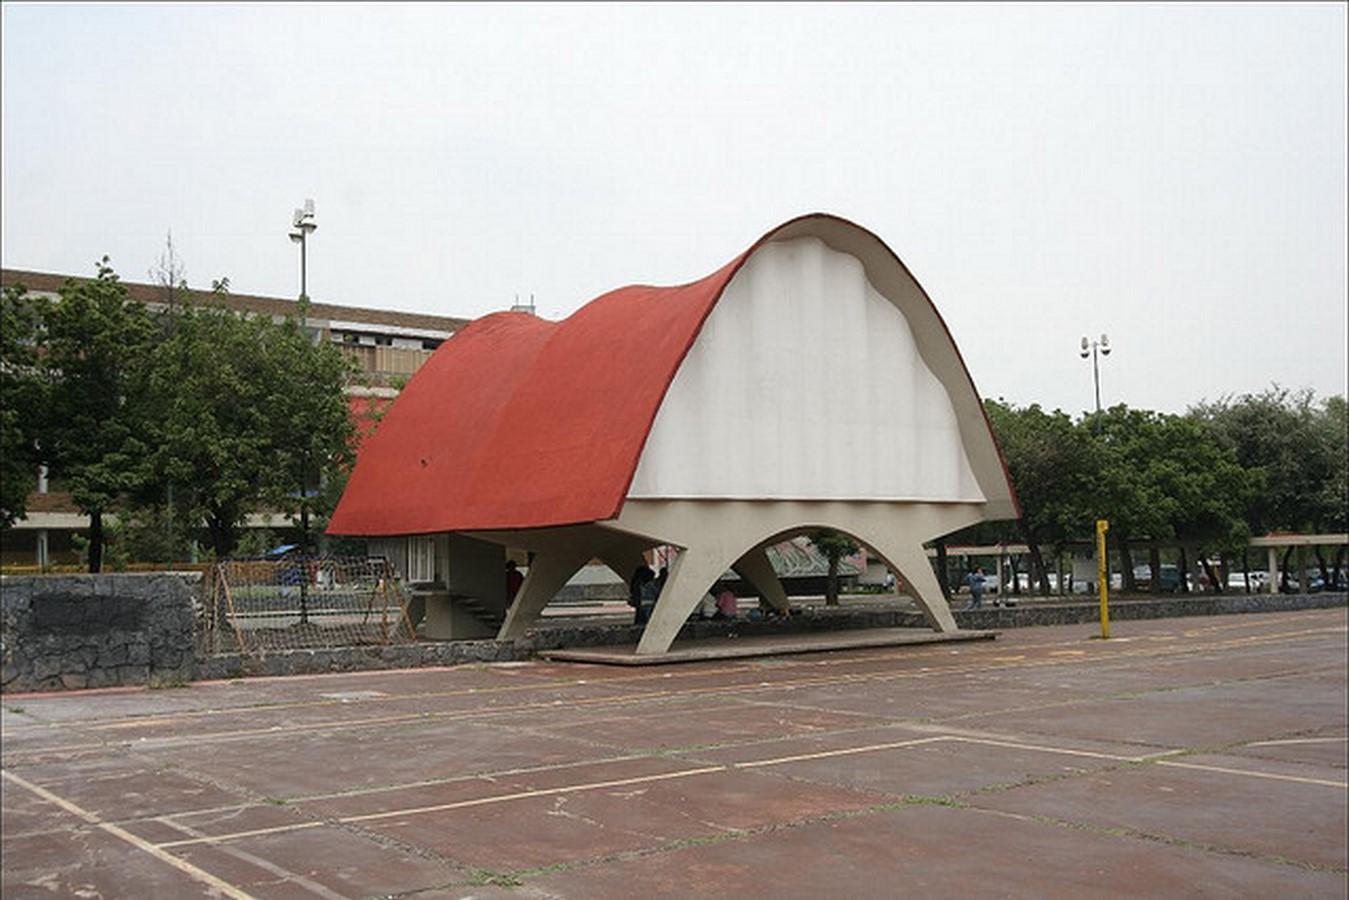 Cosmic Rays Pavilion, Mexico City, Mexico - Sheet1